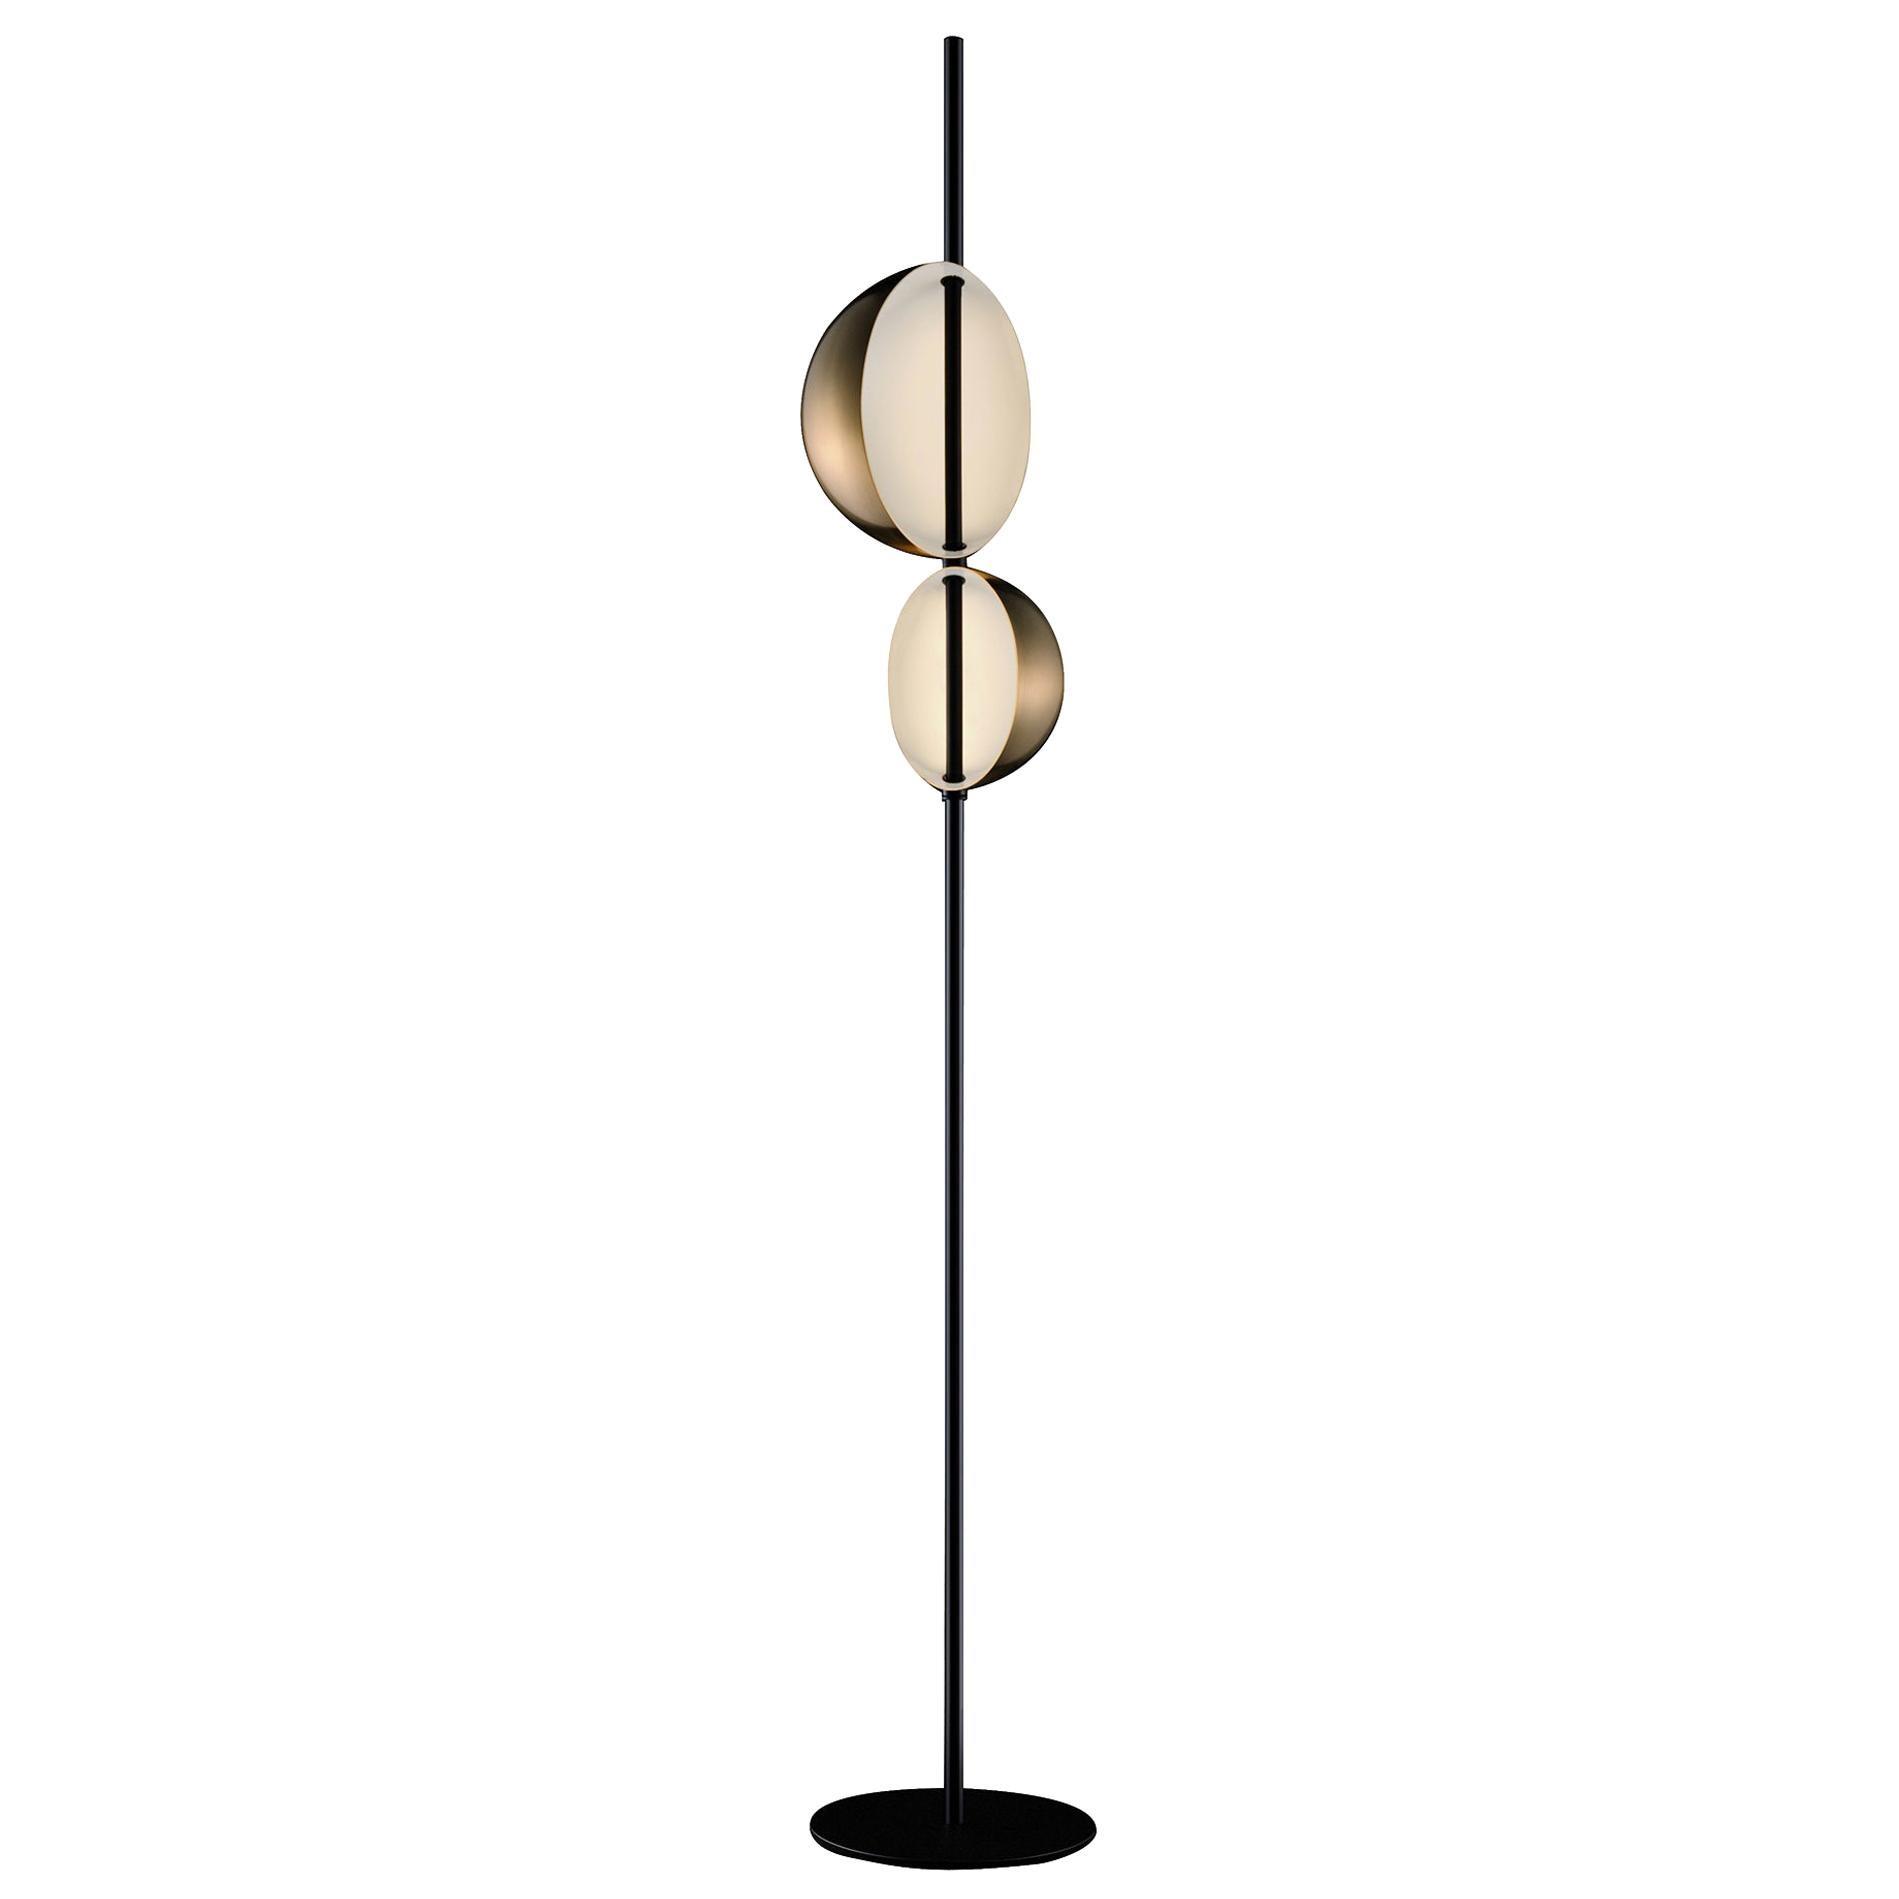 Victor Vaisilev Brass Floor Lamp 'Superluna' by Oluce